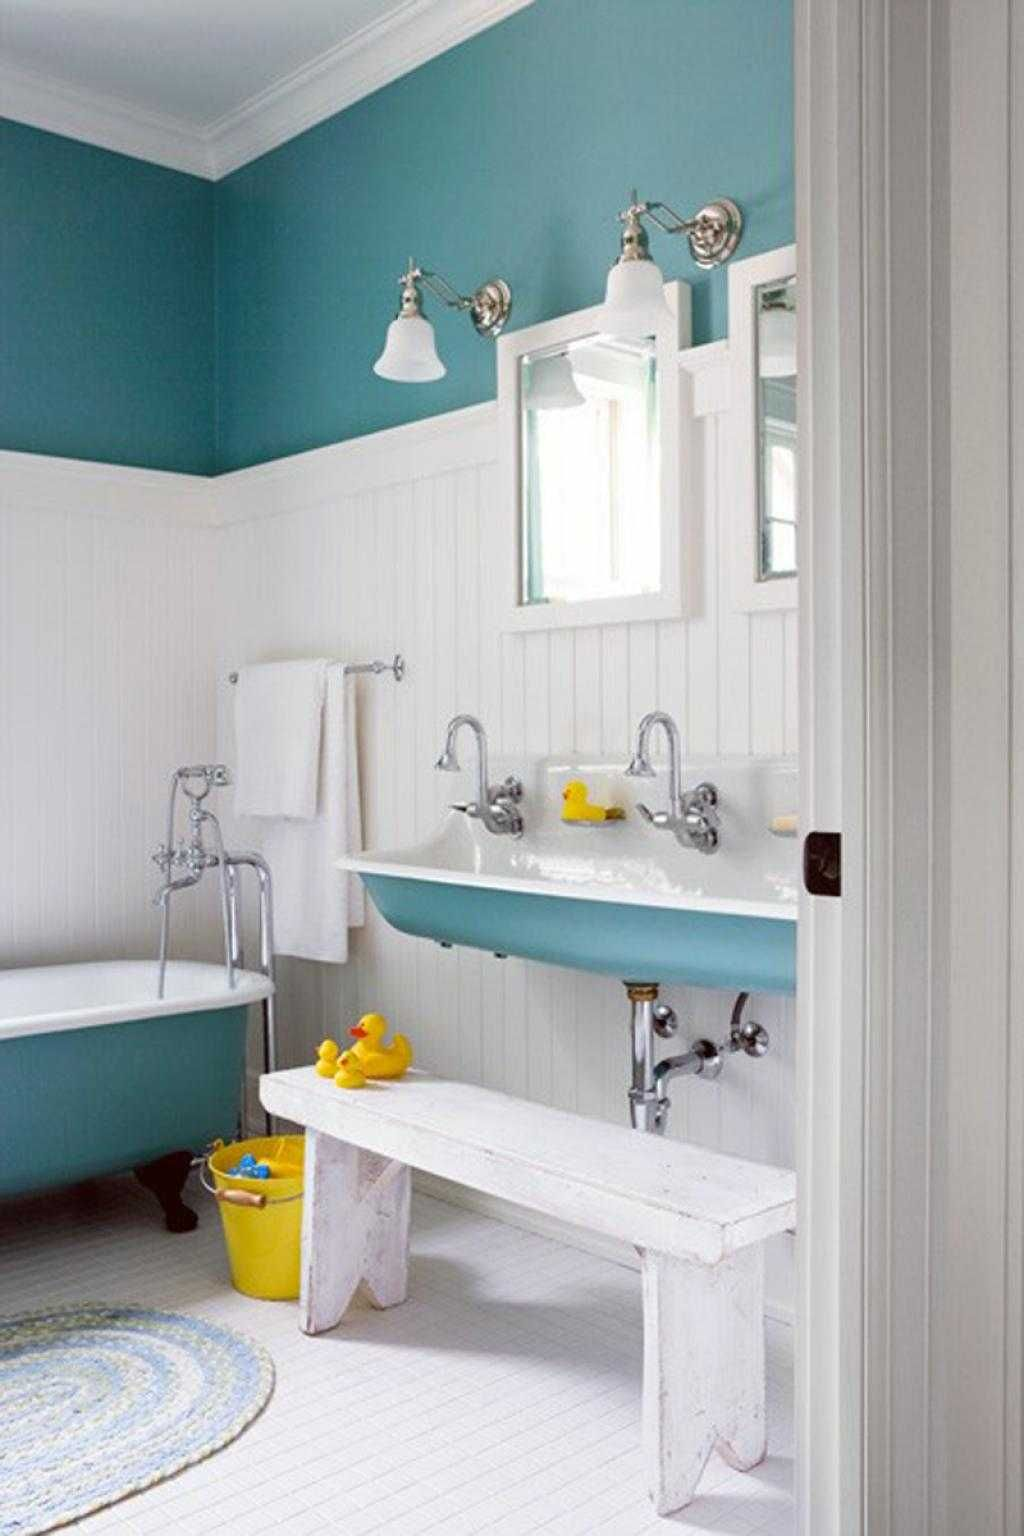 30 Colorful And Fun Kids Bathroom Ideas Kid Bathroom Decor Trendy Bathroom Bathroom Decor Fun kids bathroom ideas